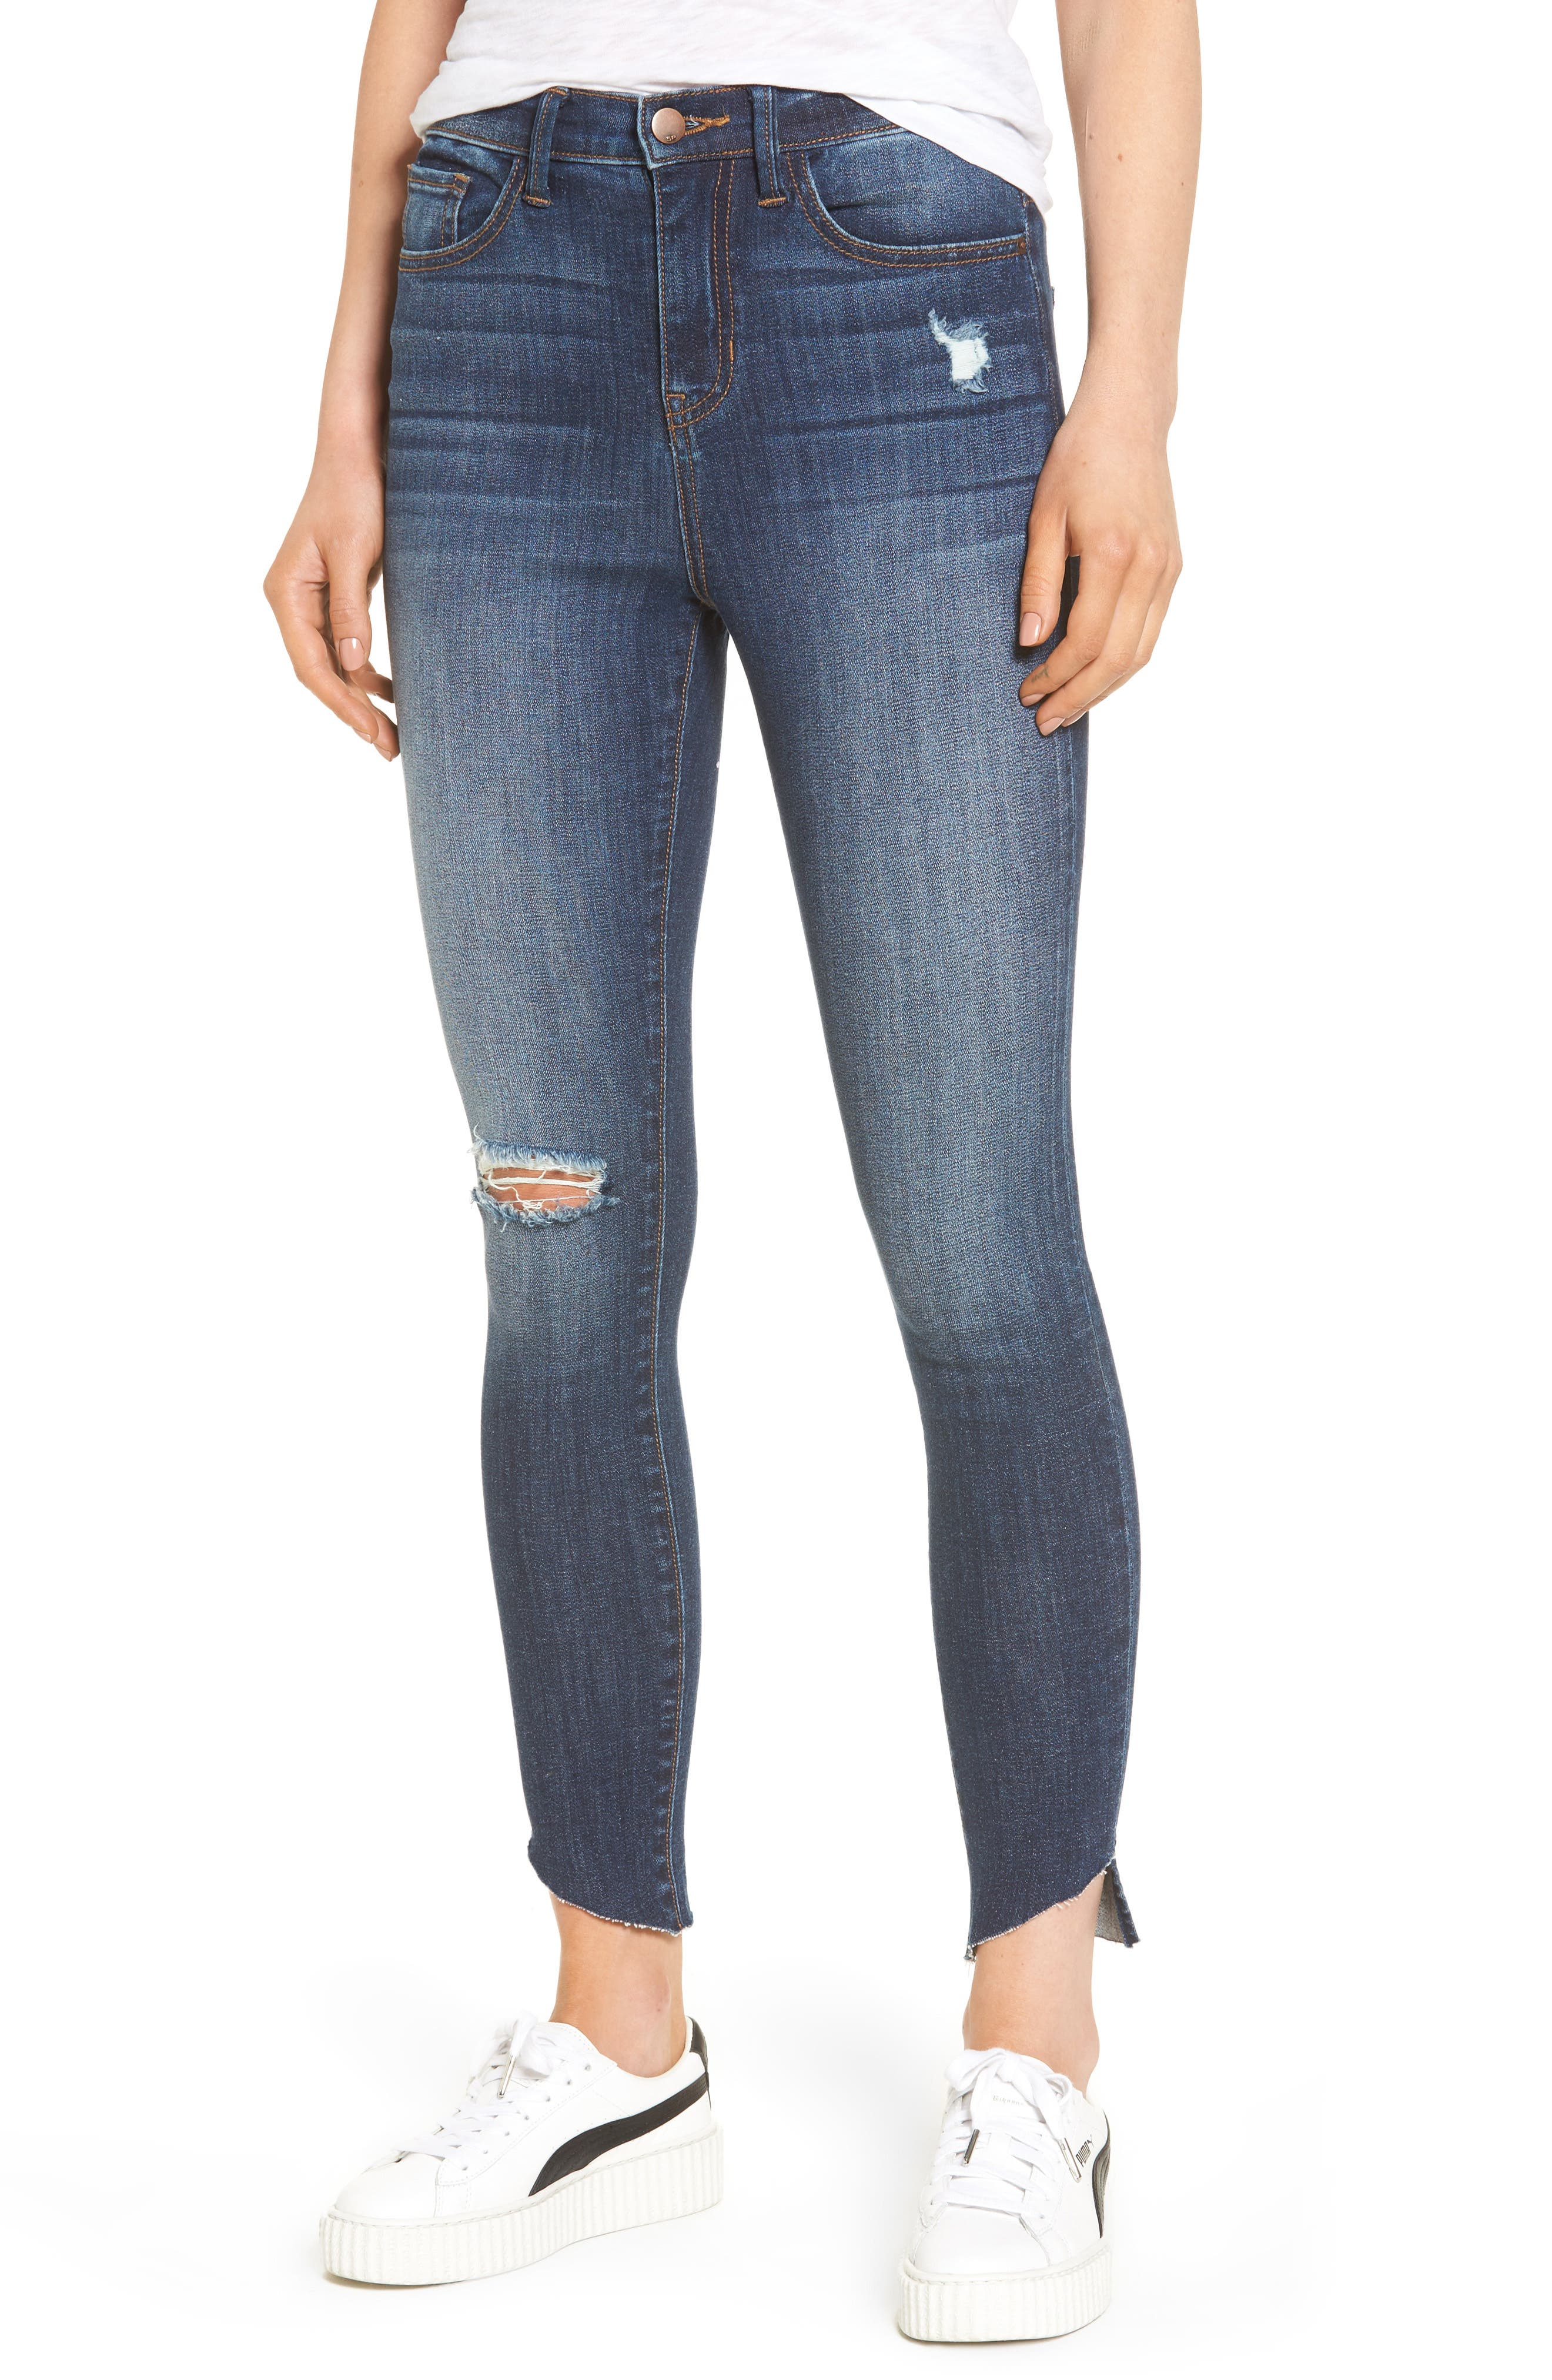 Main Image - SP Black Angled Step Hem High Waist Skinny Jeans